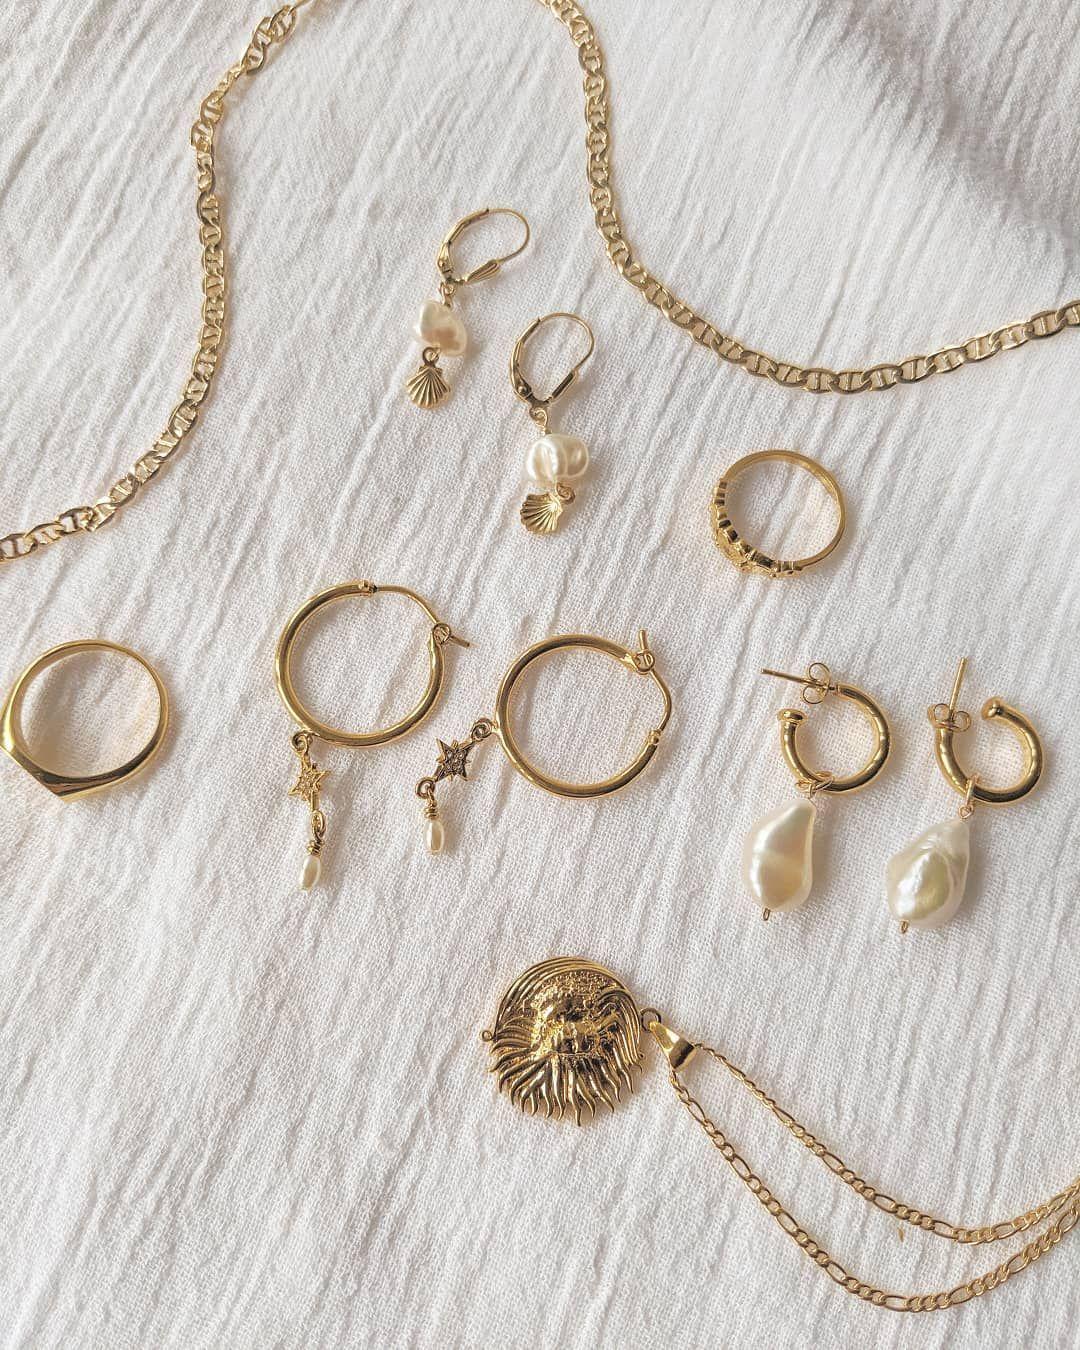 37++ Costume jewelry that won t tarnish ideas